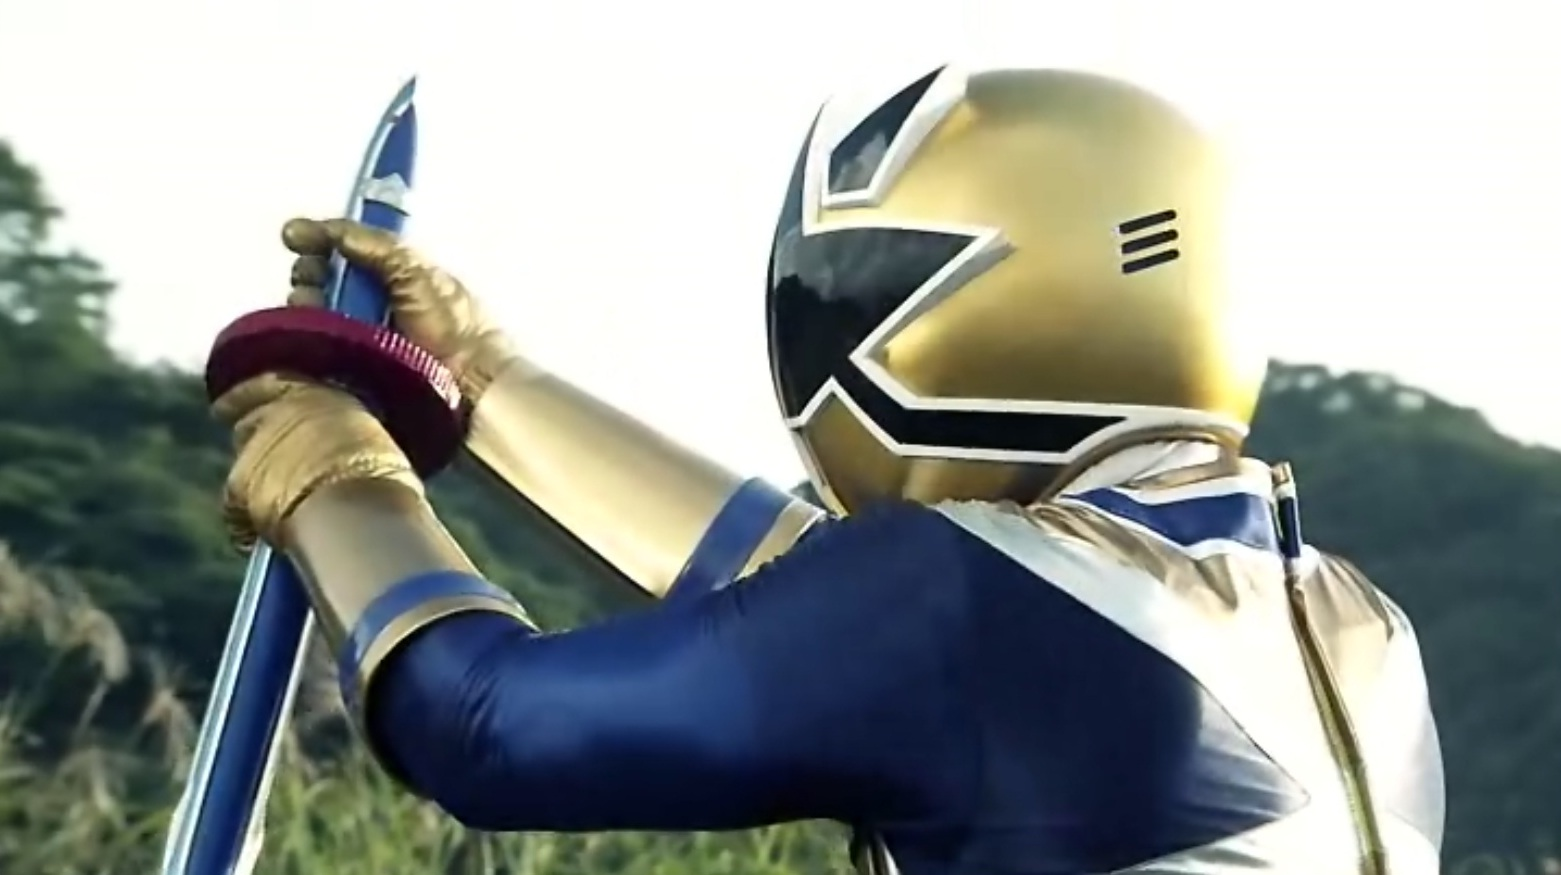 Super Sentai Images: Goseiger vs Shinkenger Images Part 2